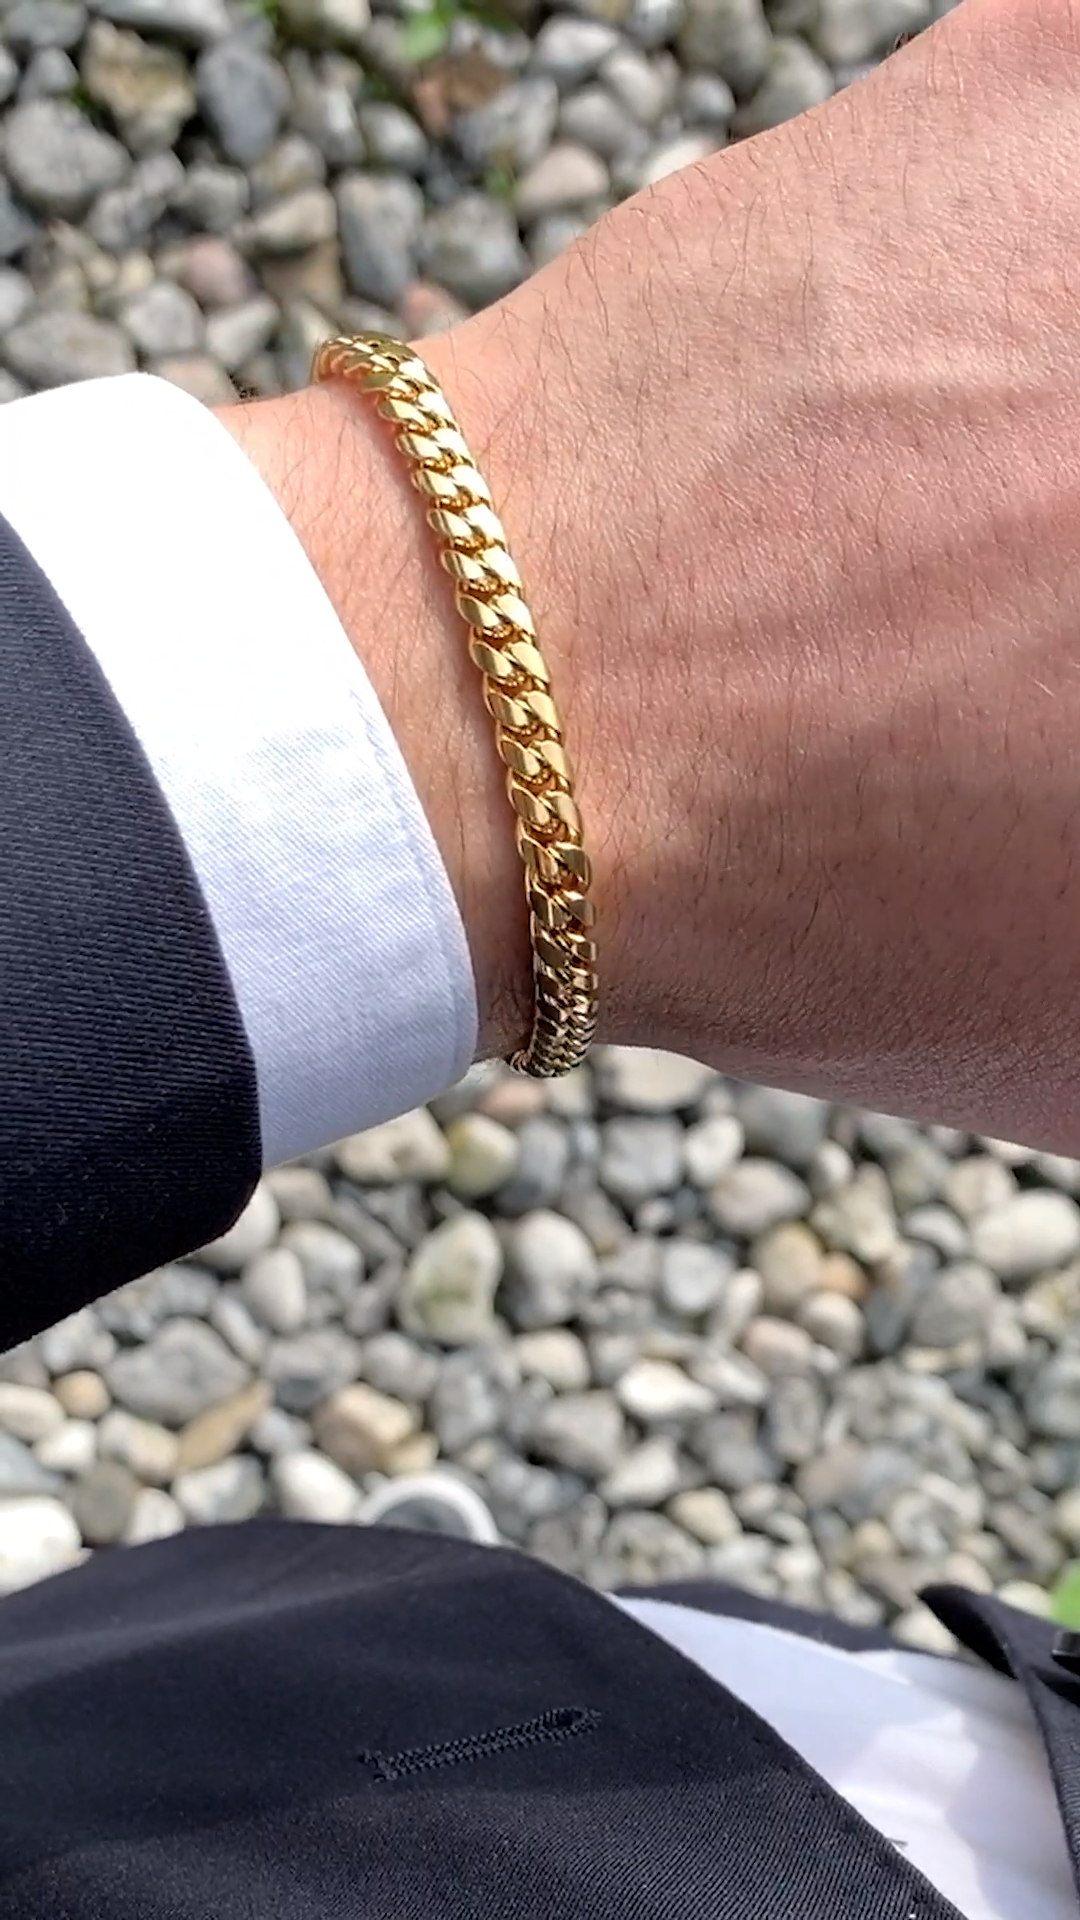 6mm Gold Tone Chain Bracelet In Stock Fort Tempus Video Video Mens Bracelet Gold Jewelry Mens Gold Bracelets Mens Gold Jewelry